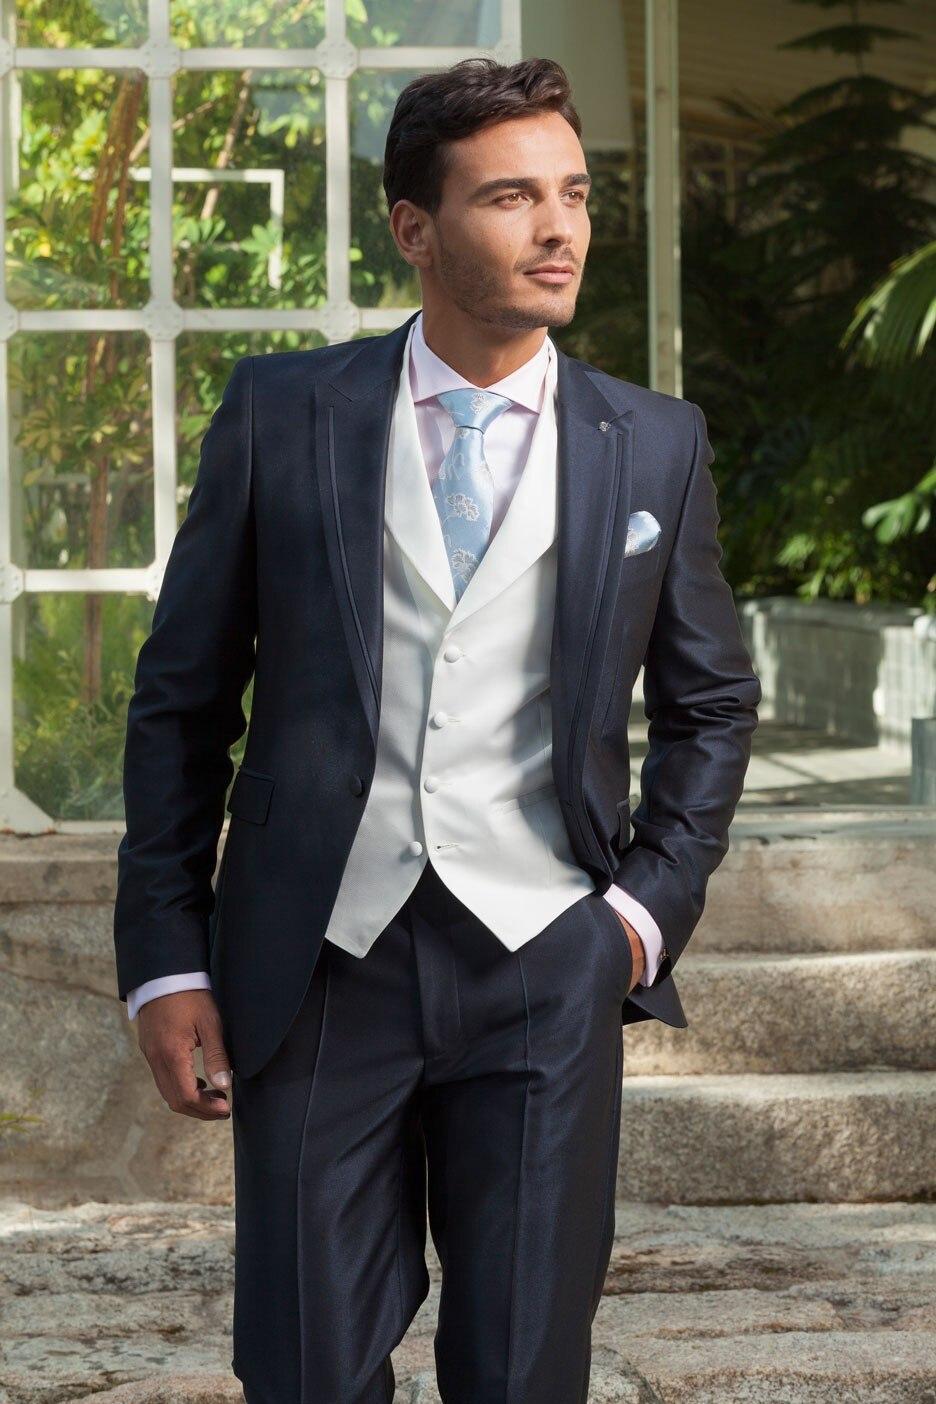 2017 Charcoal One Button Customized Wedding Ceremony Suit Groom Tuxedos Bridegroom And Groomsman Suit Jacket+Pants+Tie+Vest